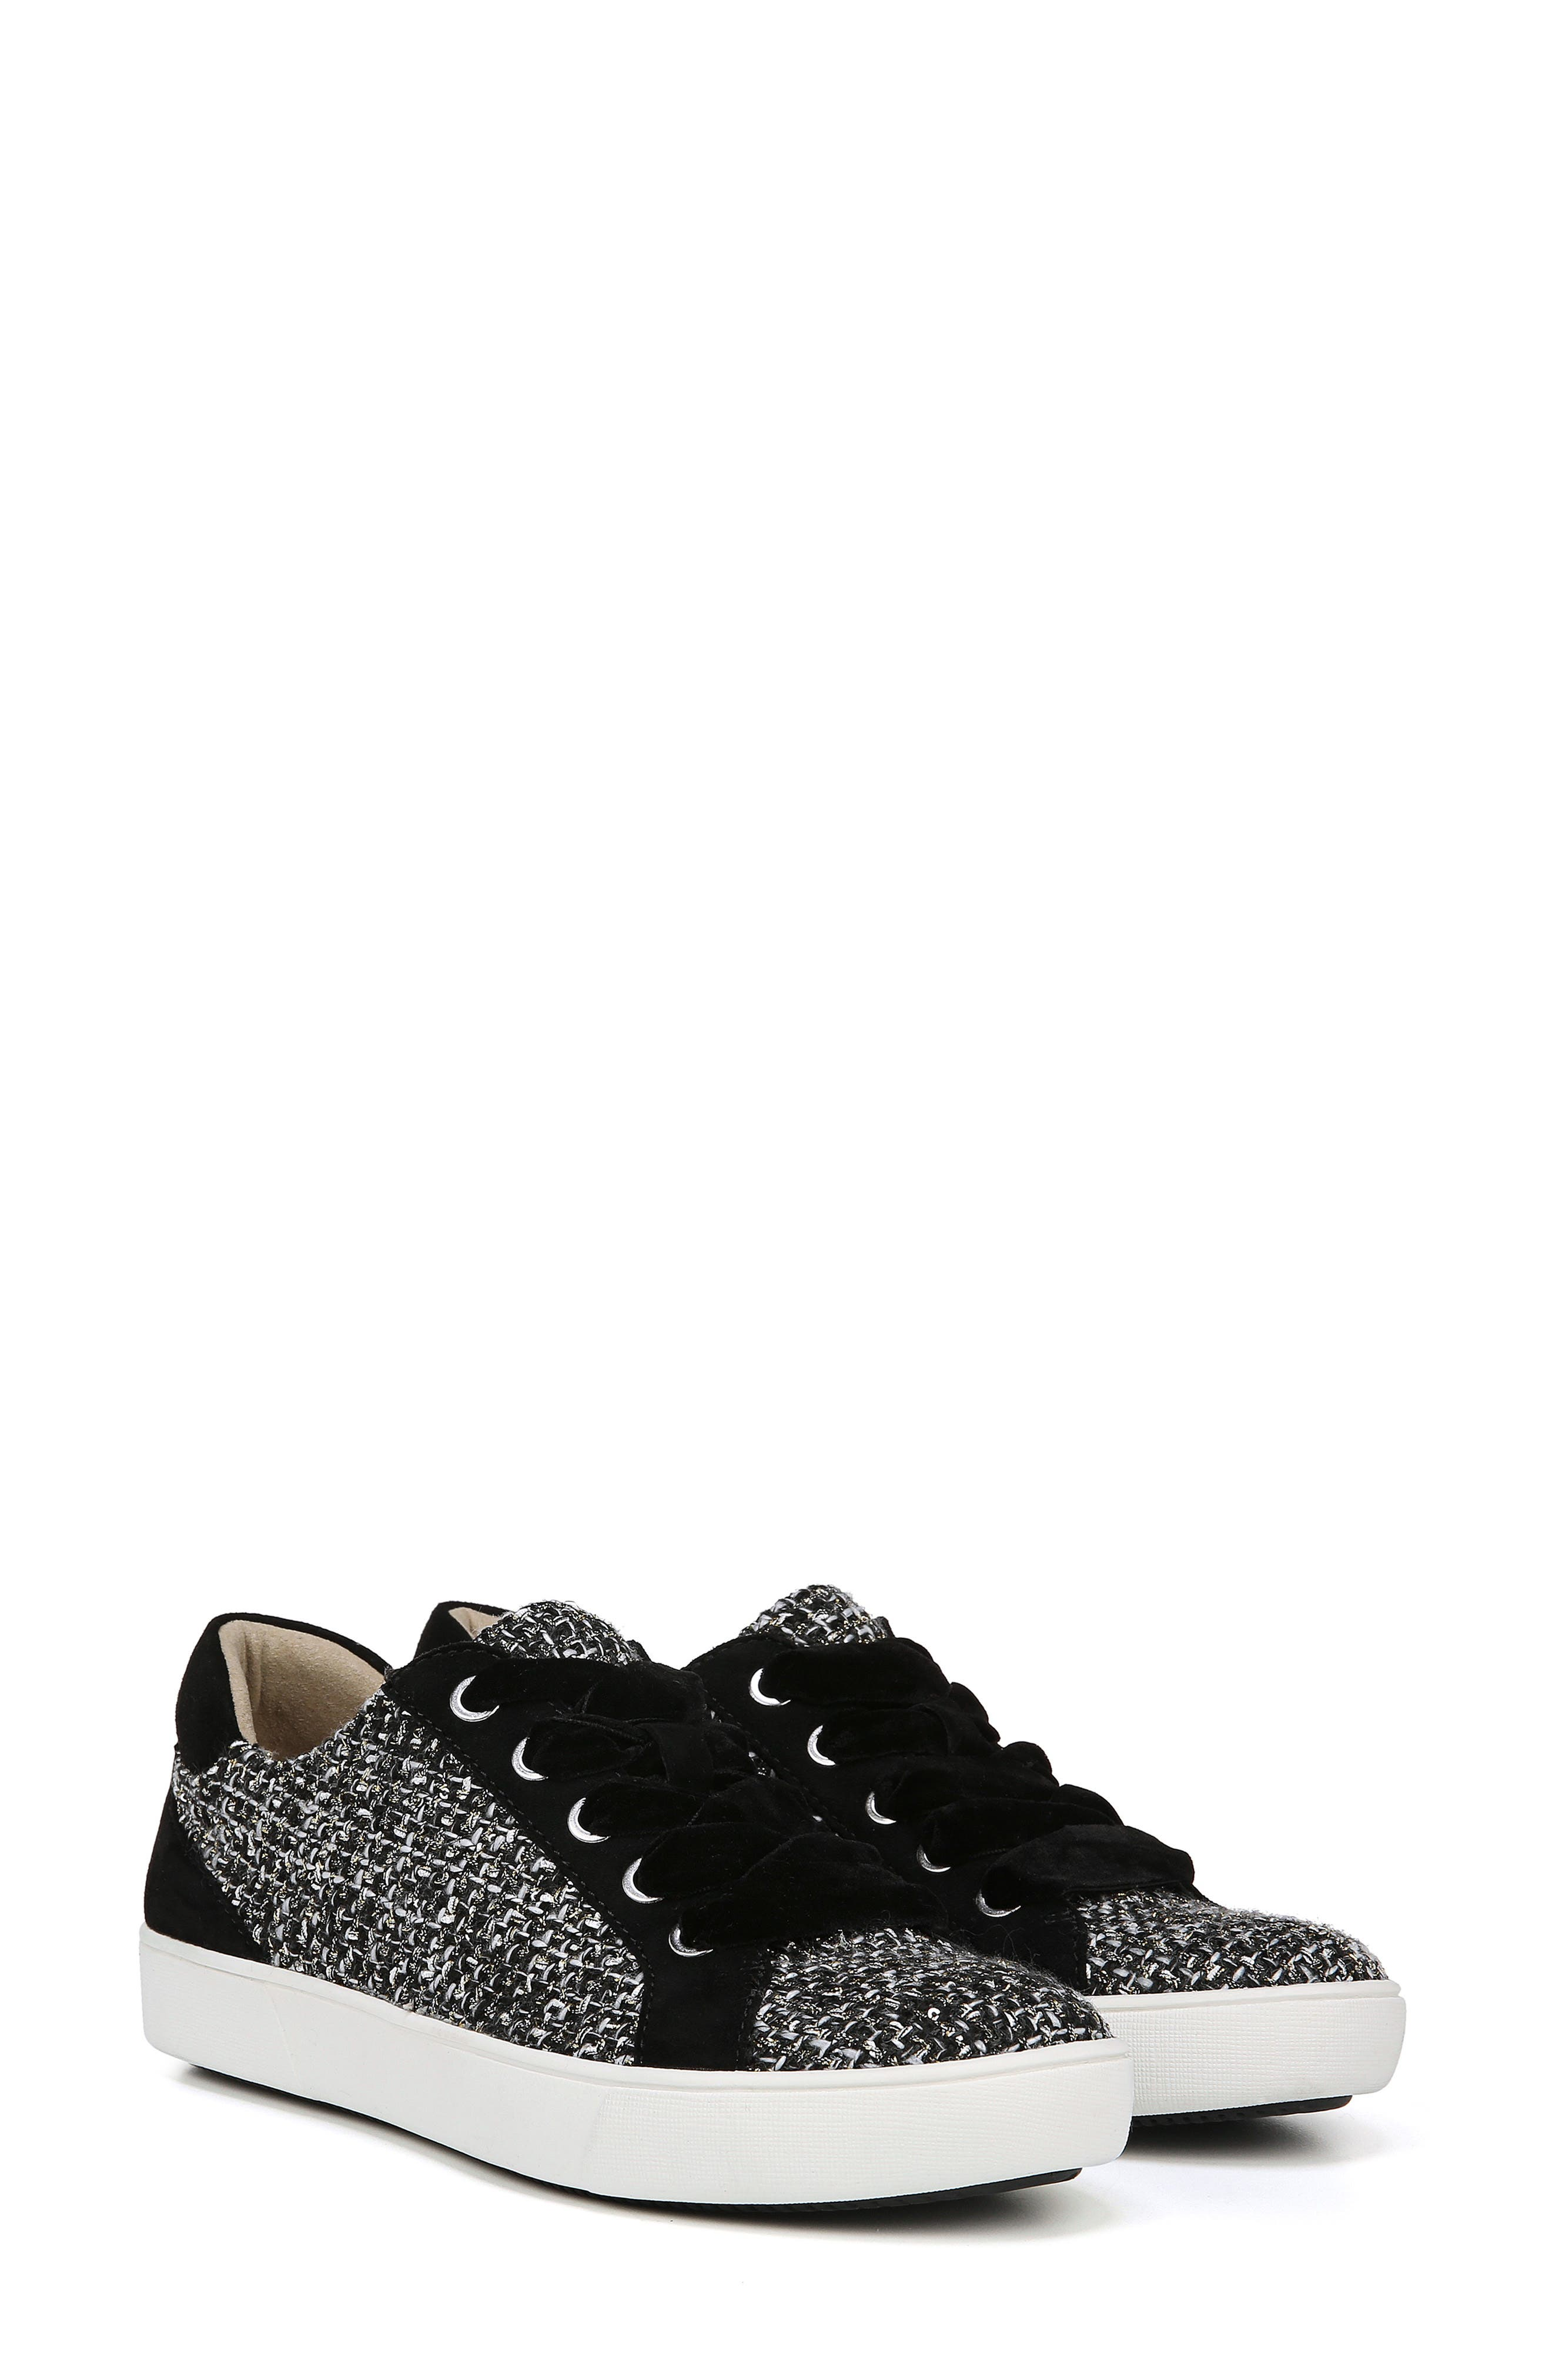 Morrison Sneaker,                             Alternate thumbnail 7, color,                             BLACK/ WHITE TWEED FABRIC